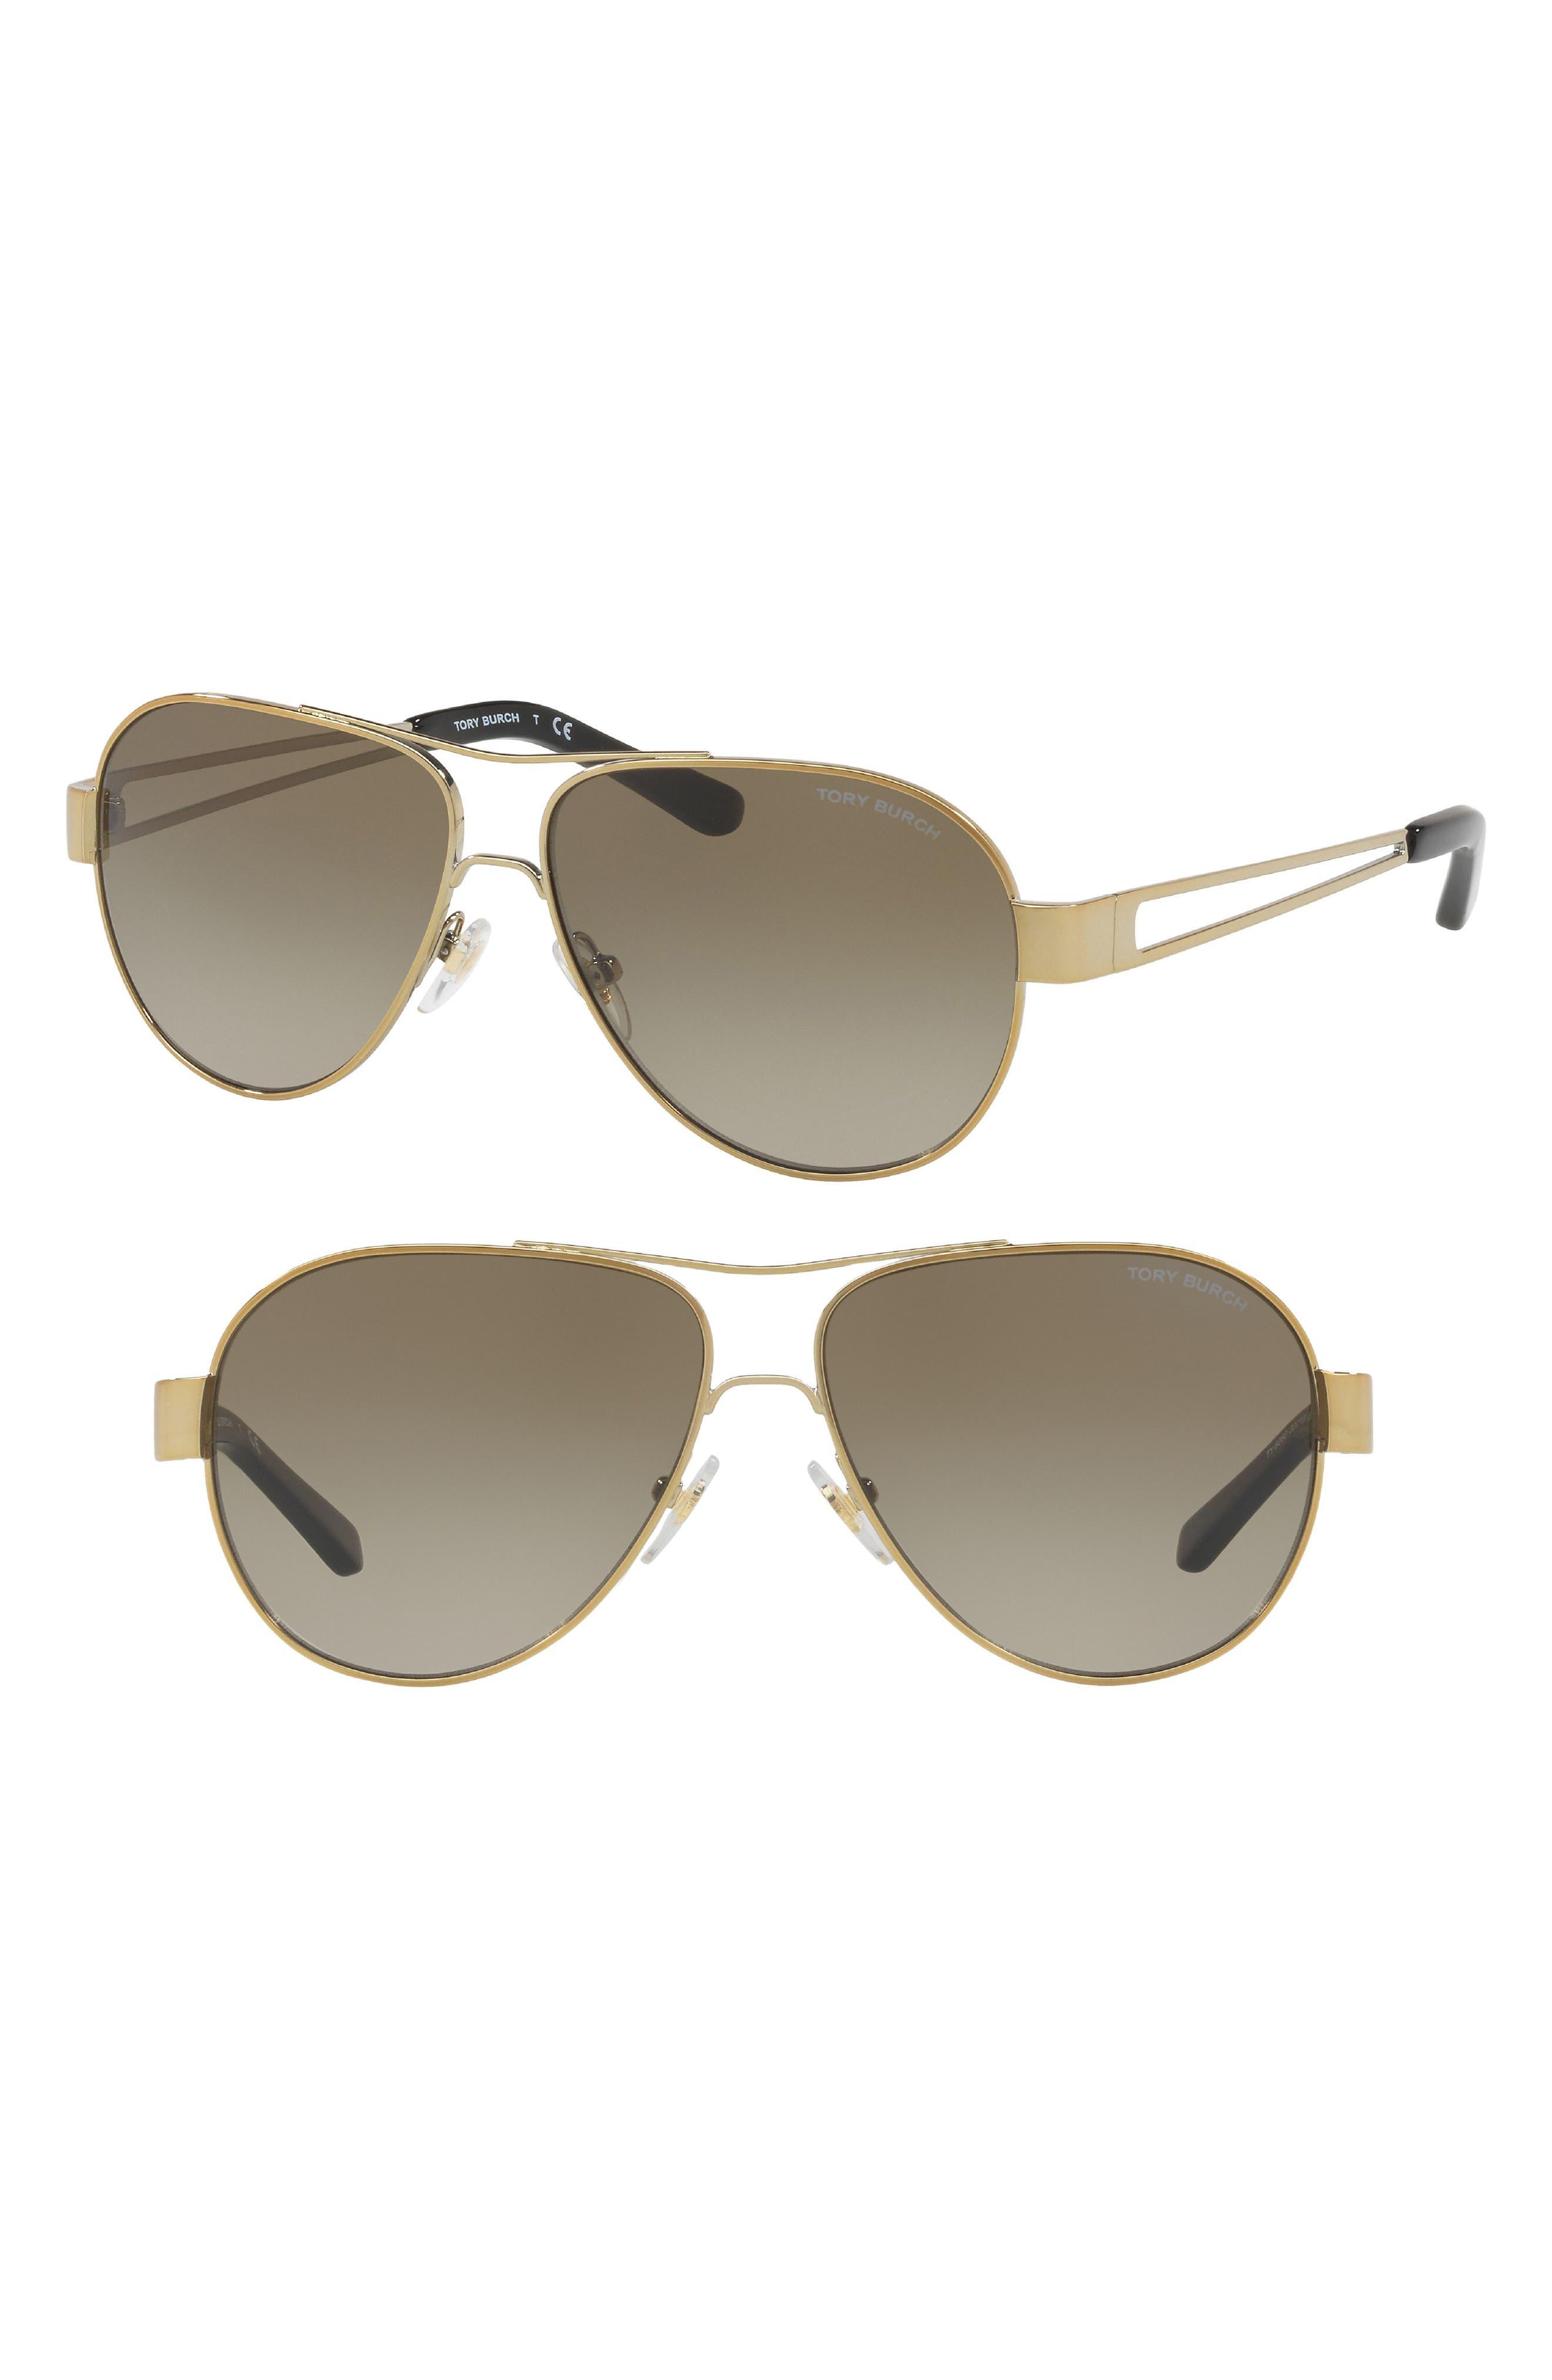 55mm Polarized Aviator Sunglasses,                             Alternate thumbnail 11, color,